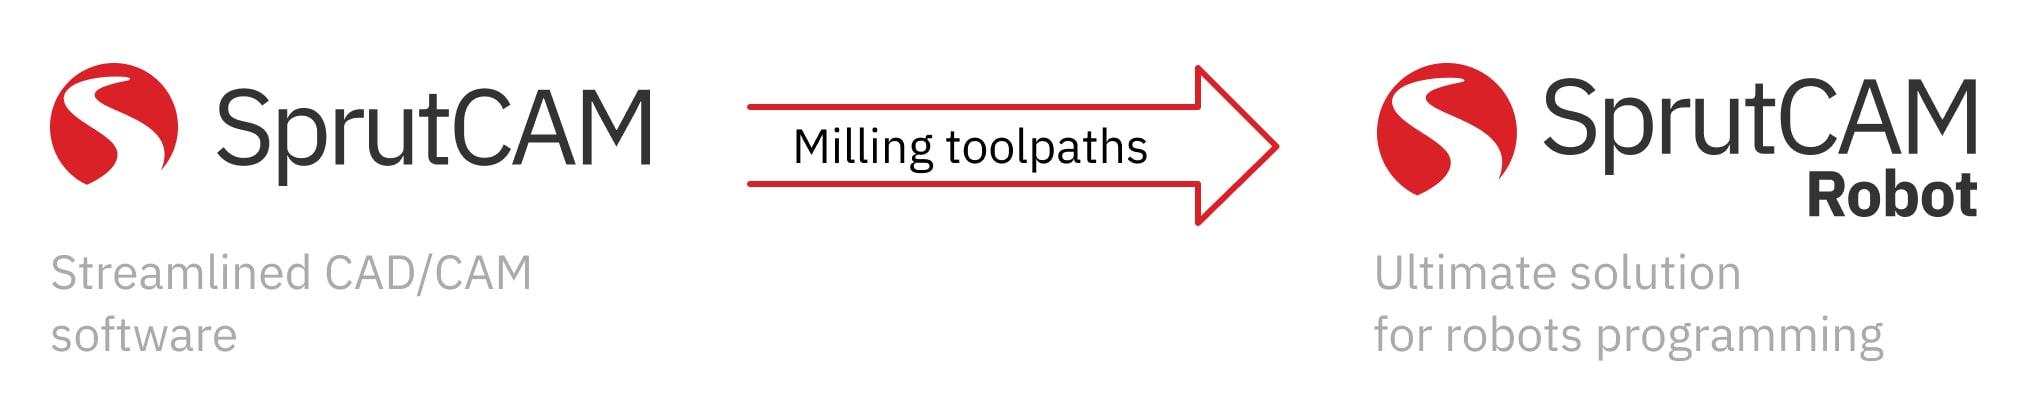 SprutCAM milling toolpath